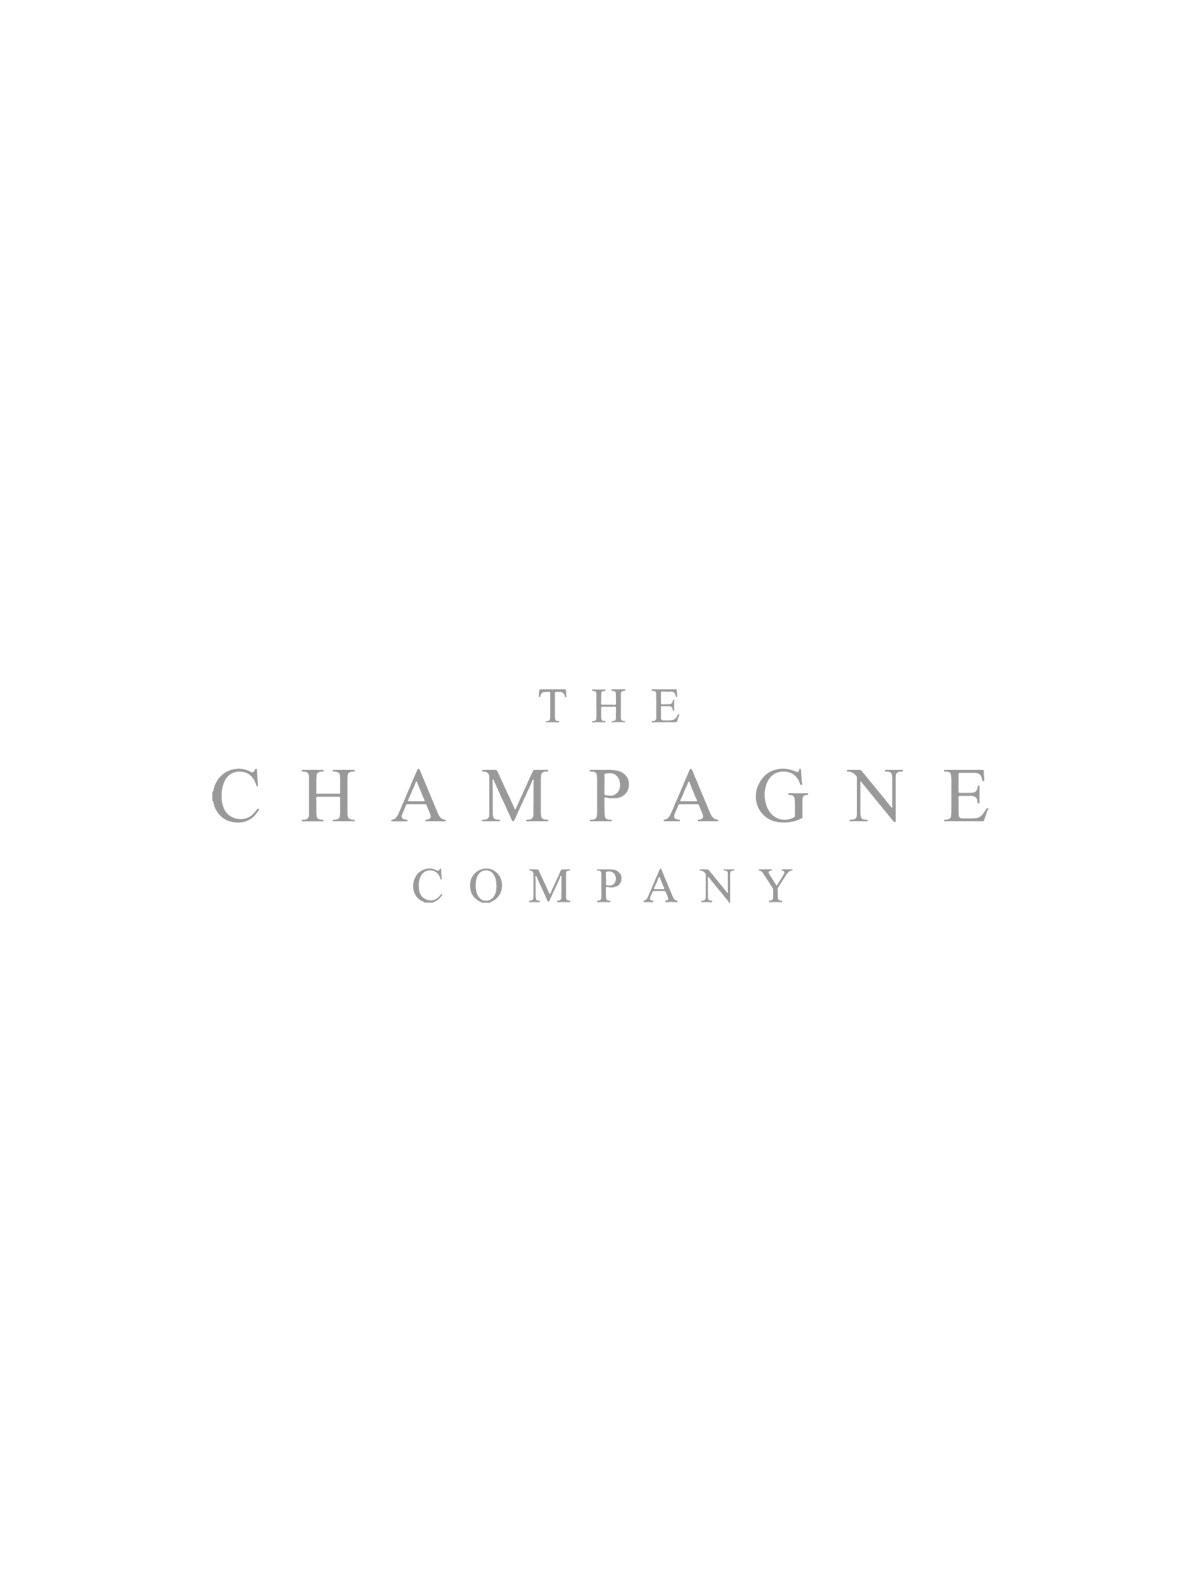 Smooth Ambler Greenbrier Gin 75cl